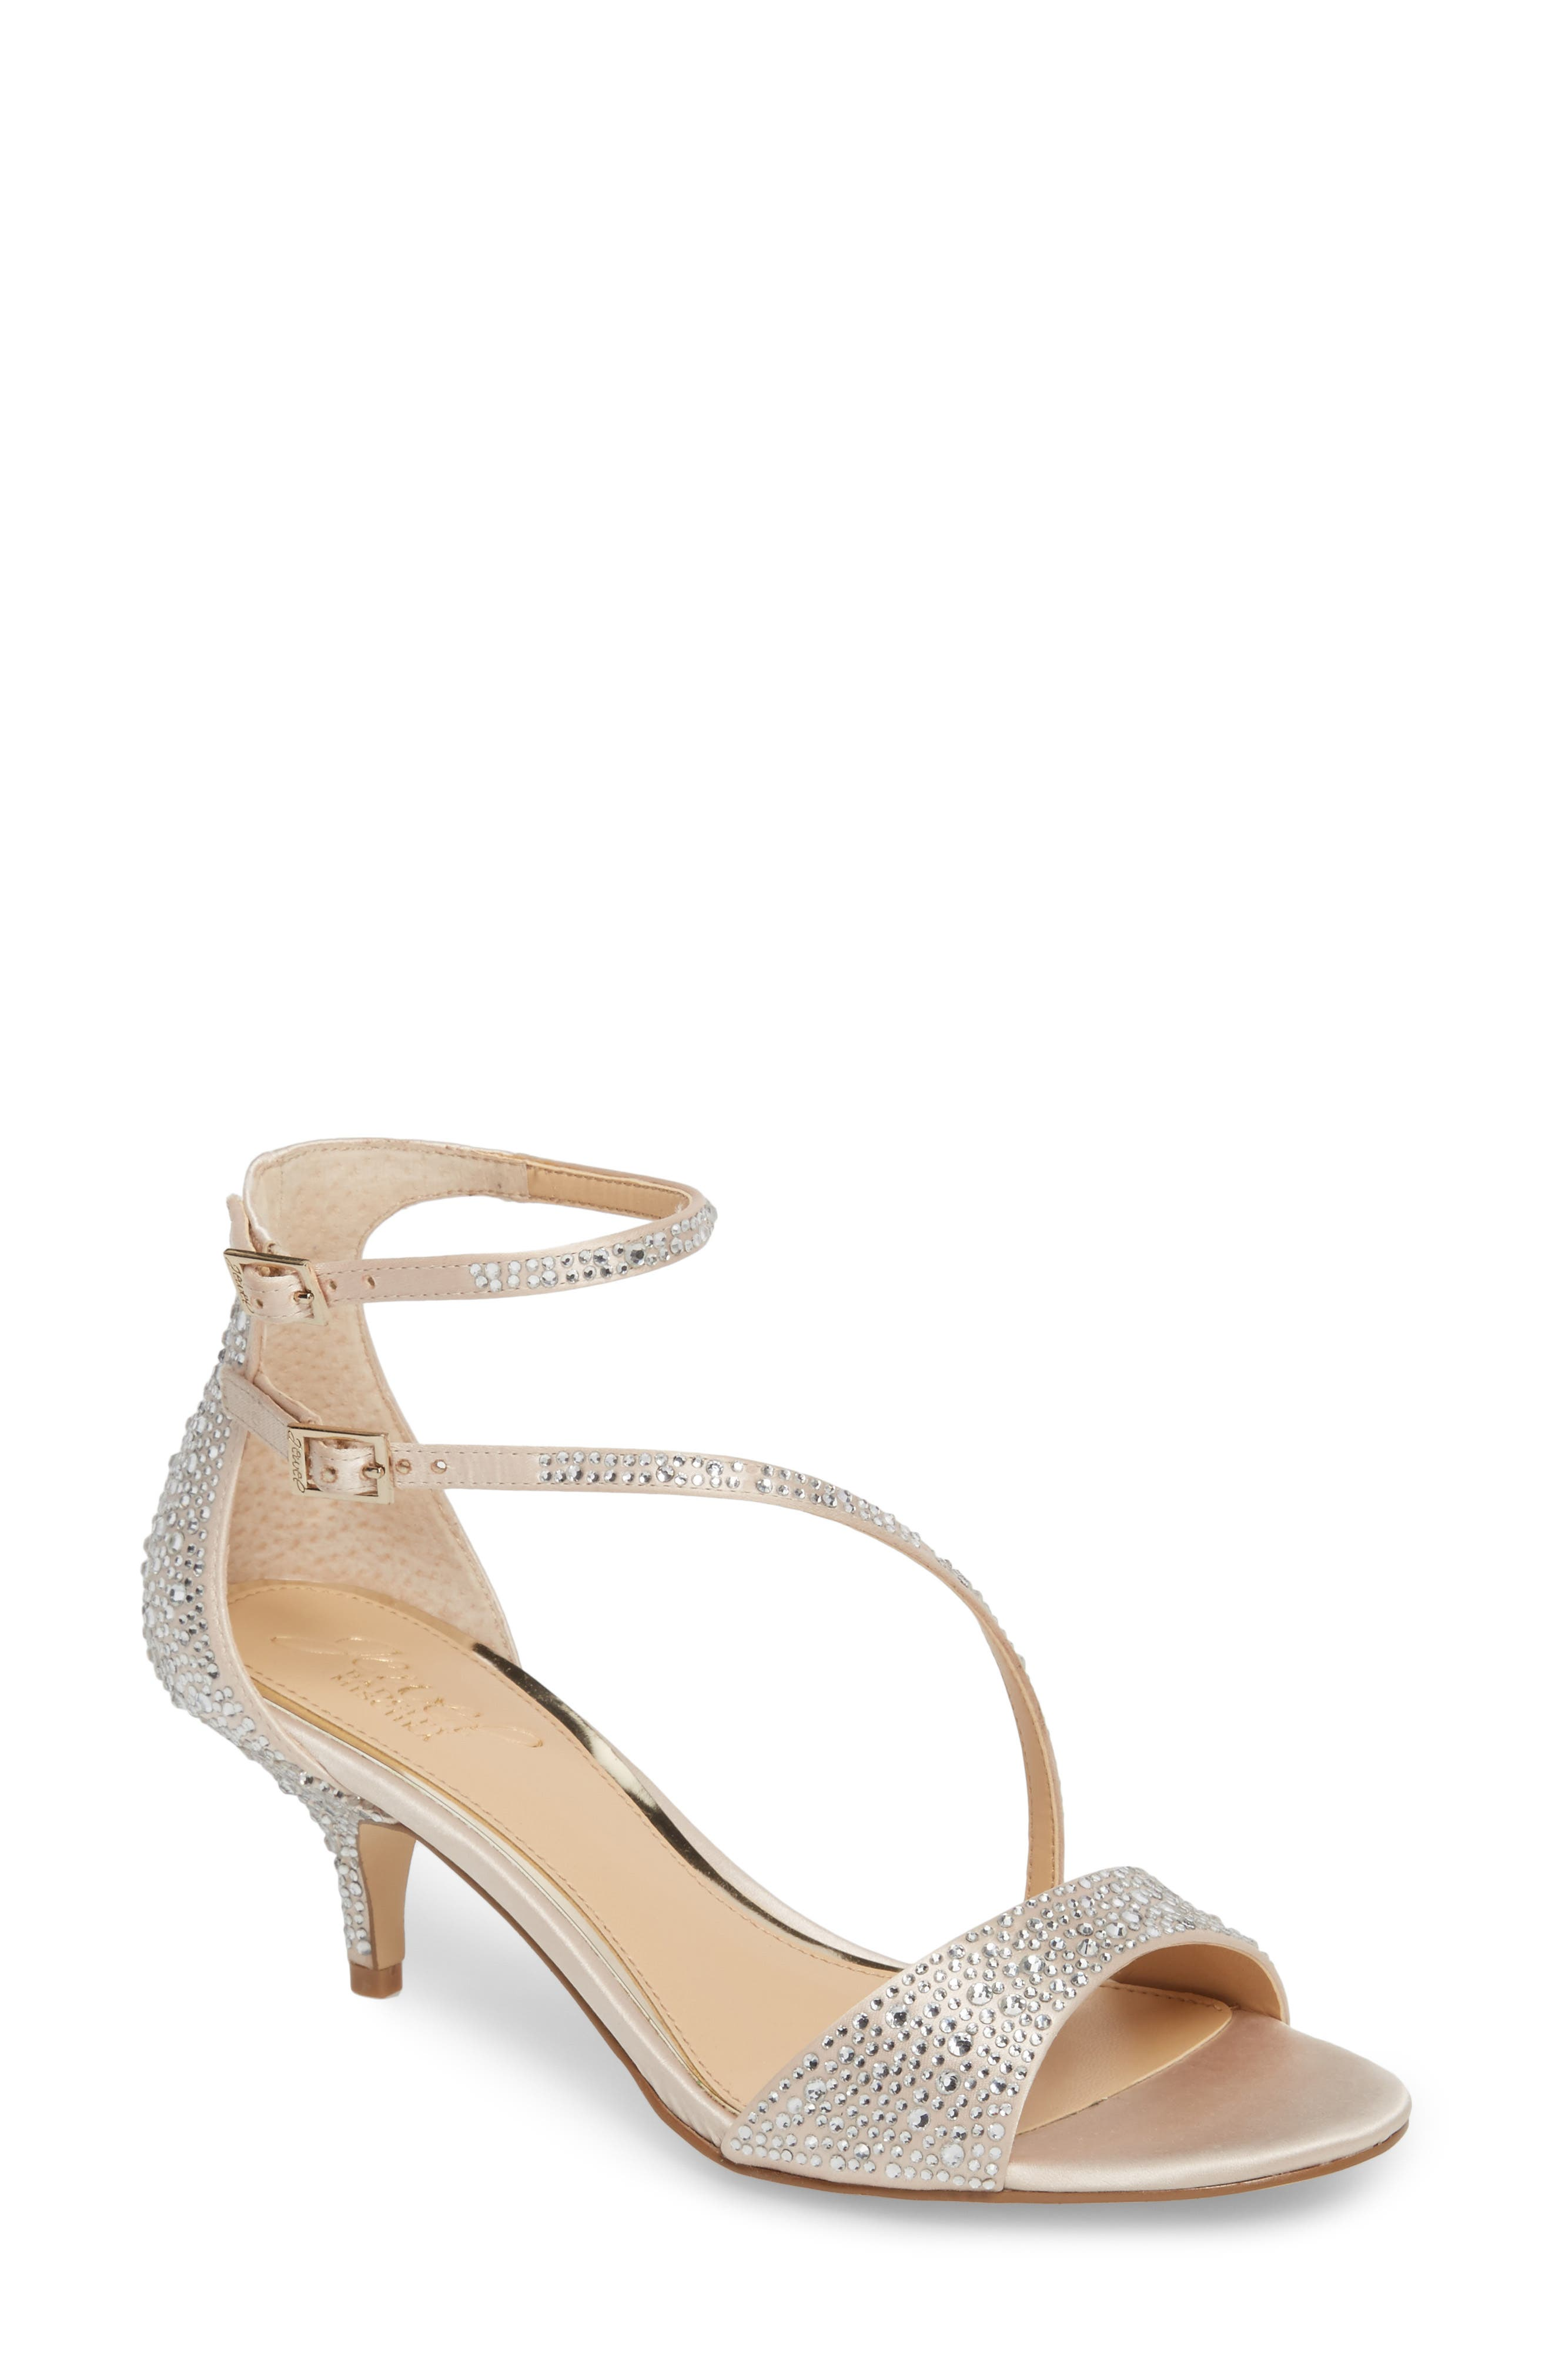 Tangerine Crystal Embellished Sandal,                             Main thumbnail 1, color,                             CHAMPAGNE SATIN